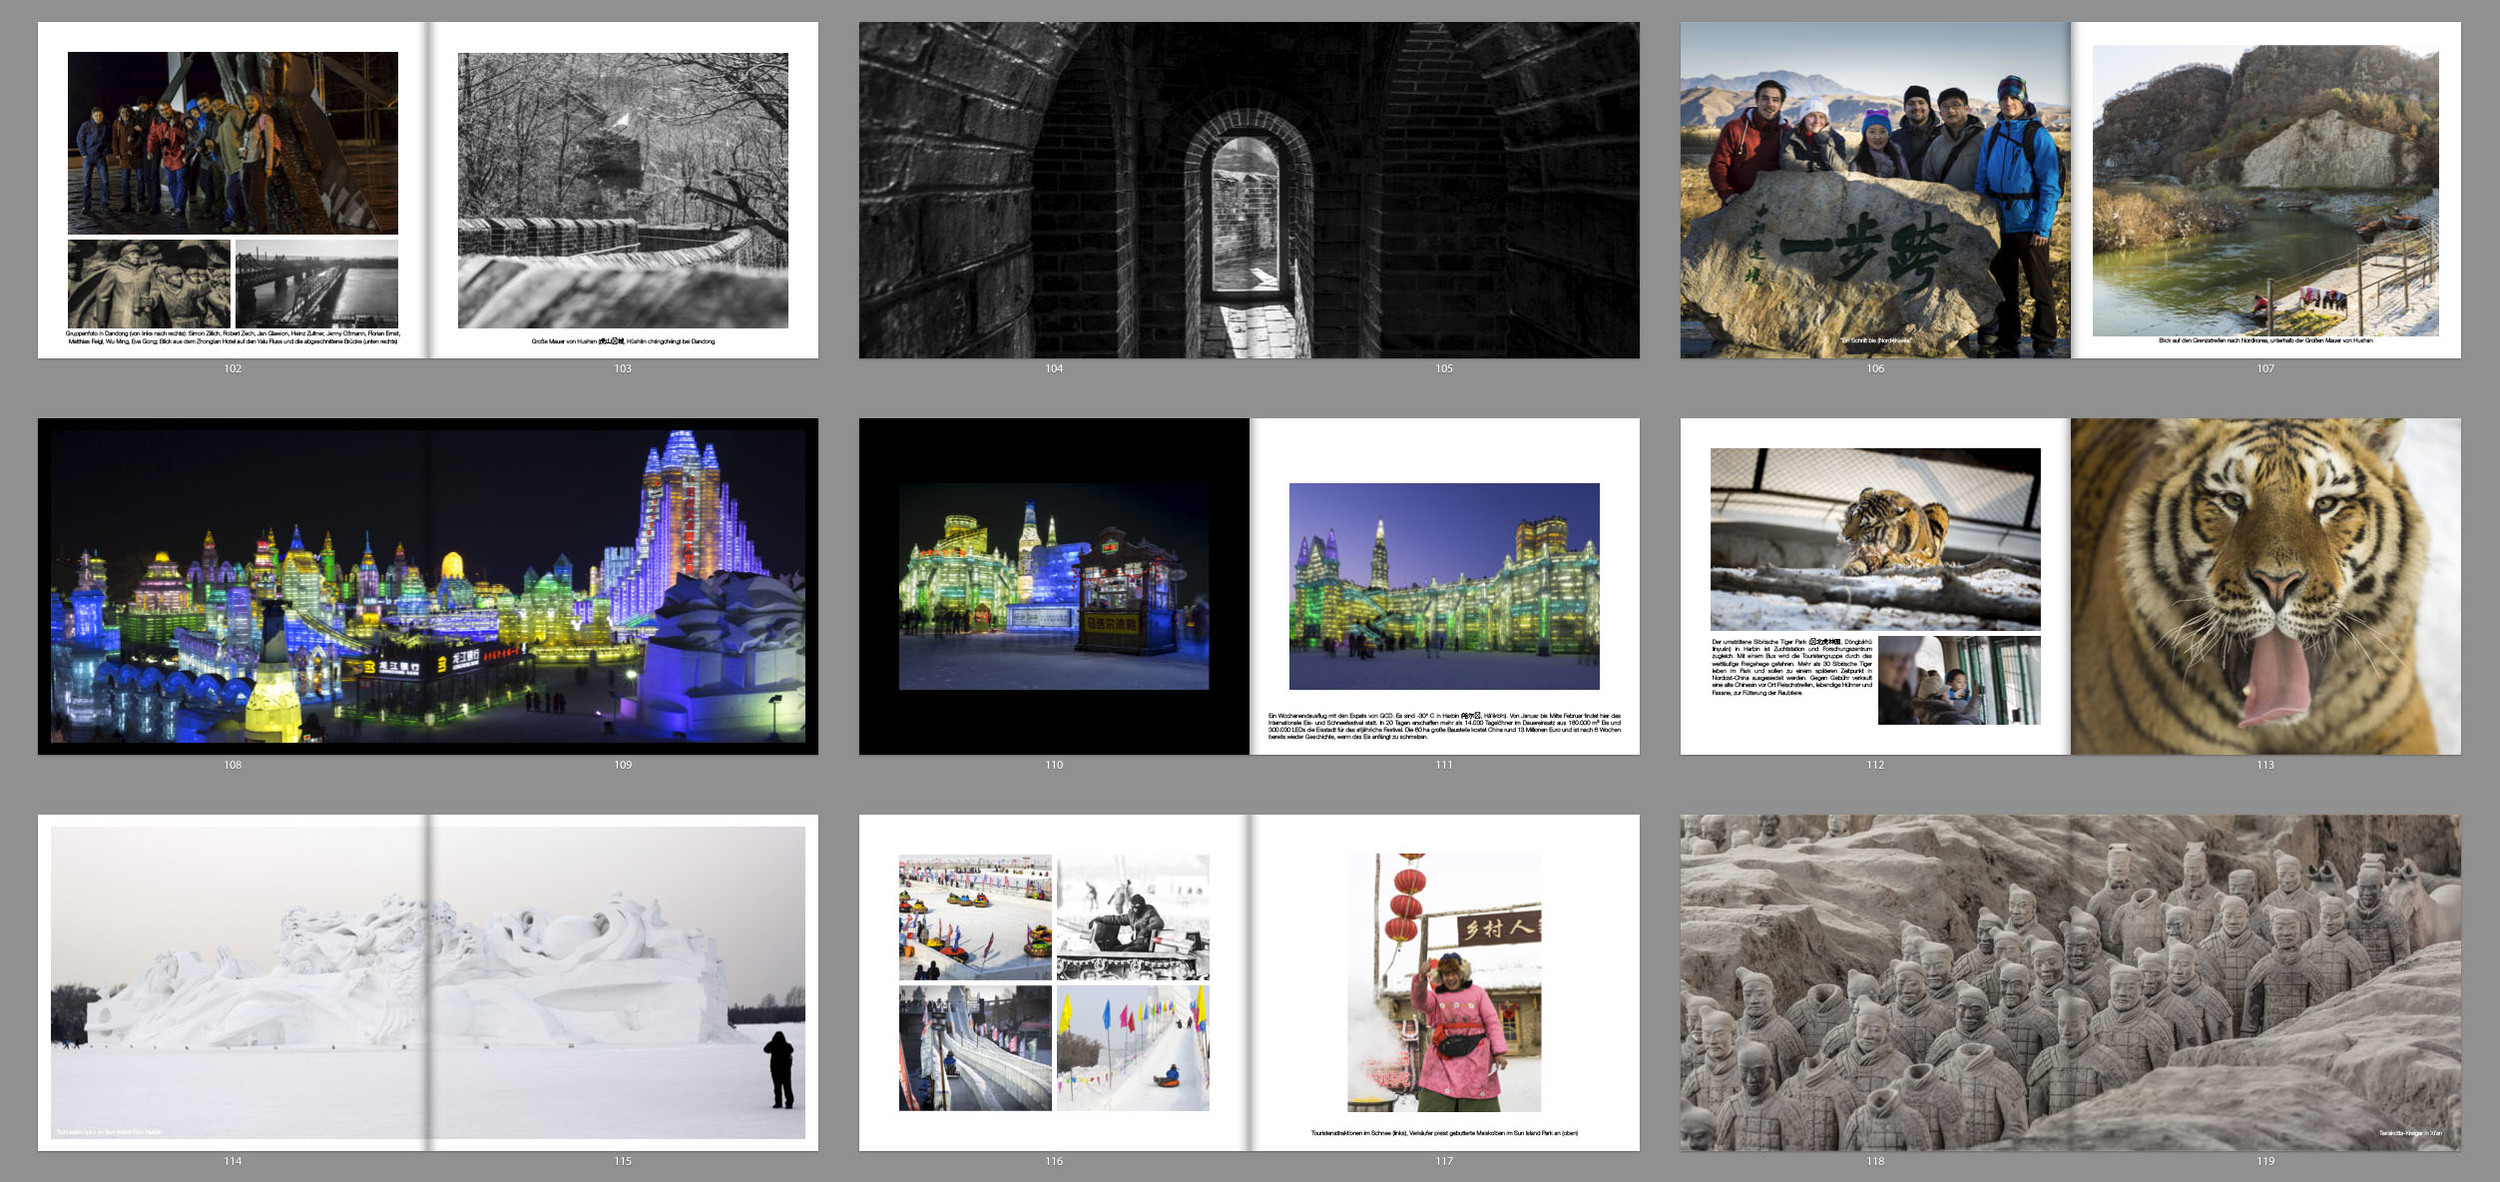 China Photobook Page 102-119.jpg